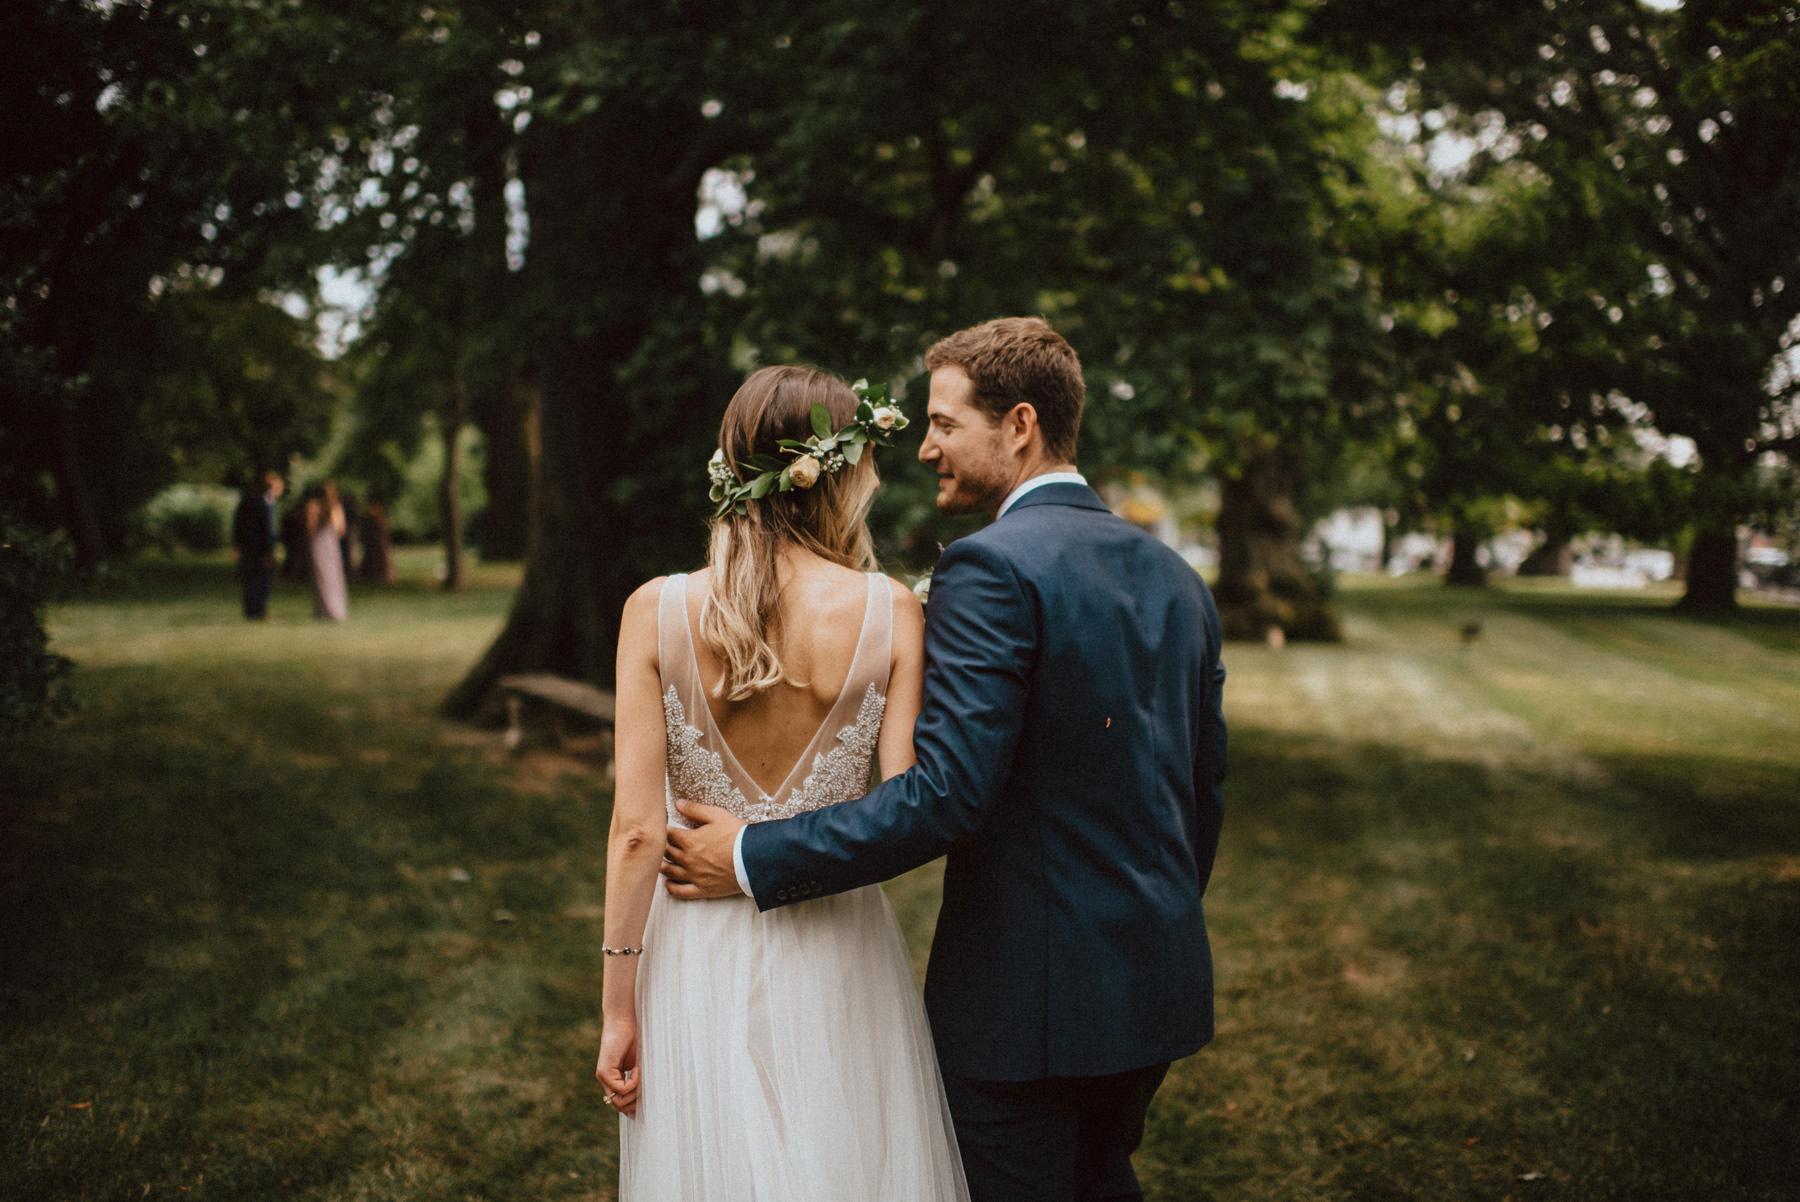 005-knowlton-mansion-wedding-13.jpg